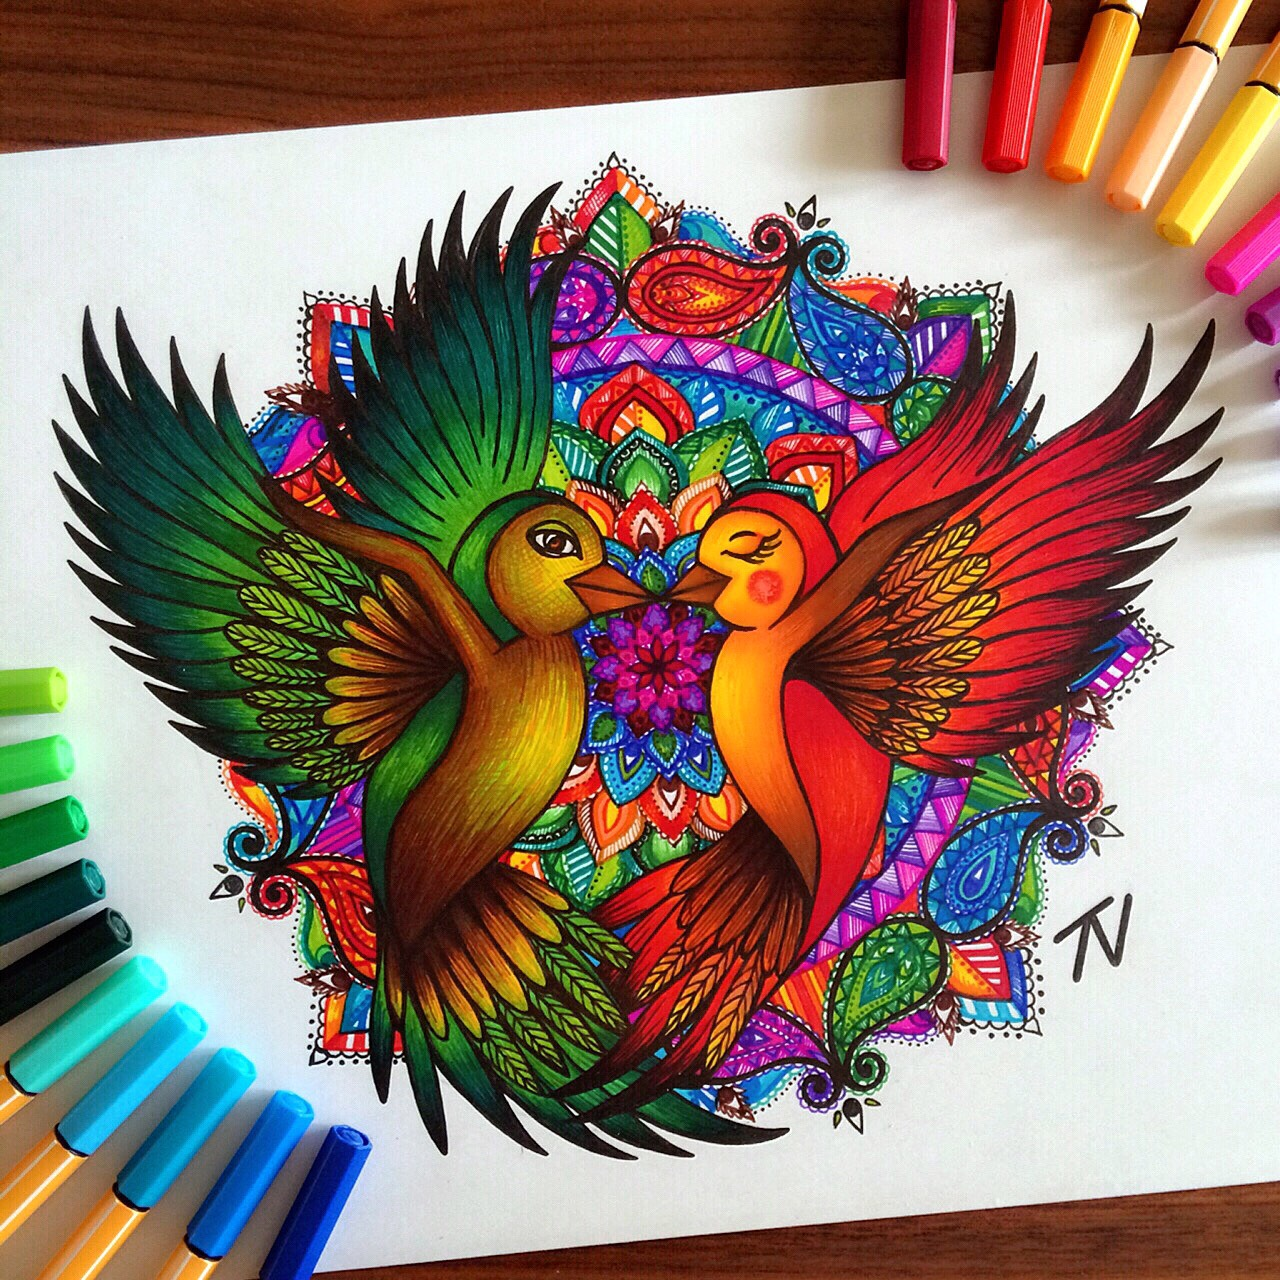 The vibrant art of mandalas by Nigar Tahmazova